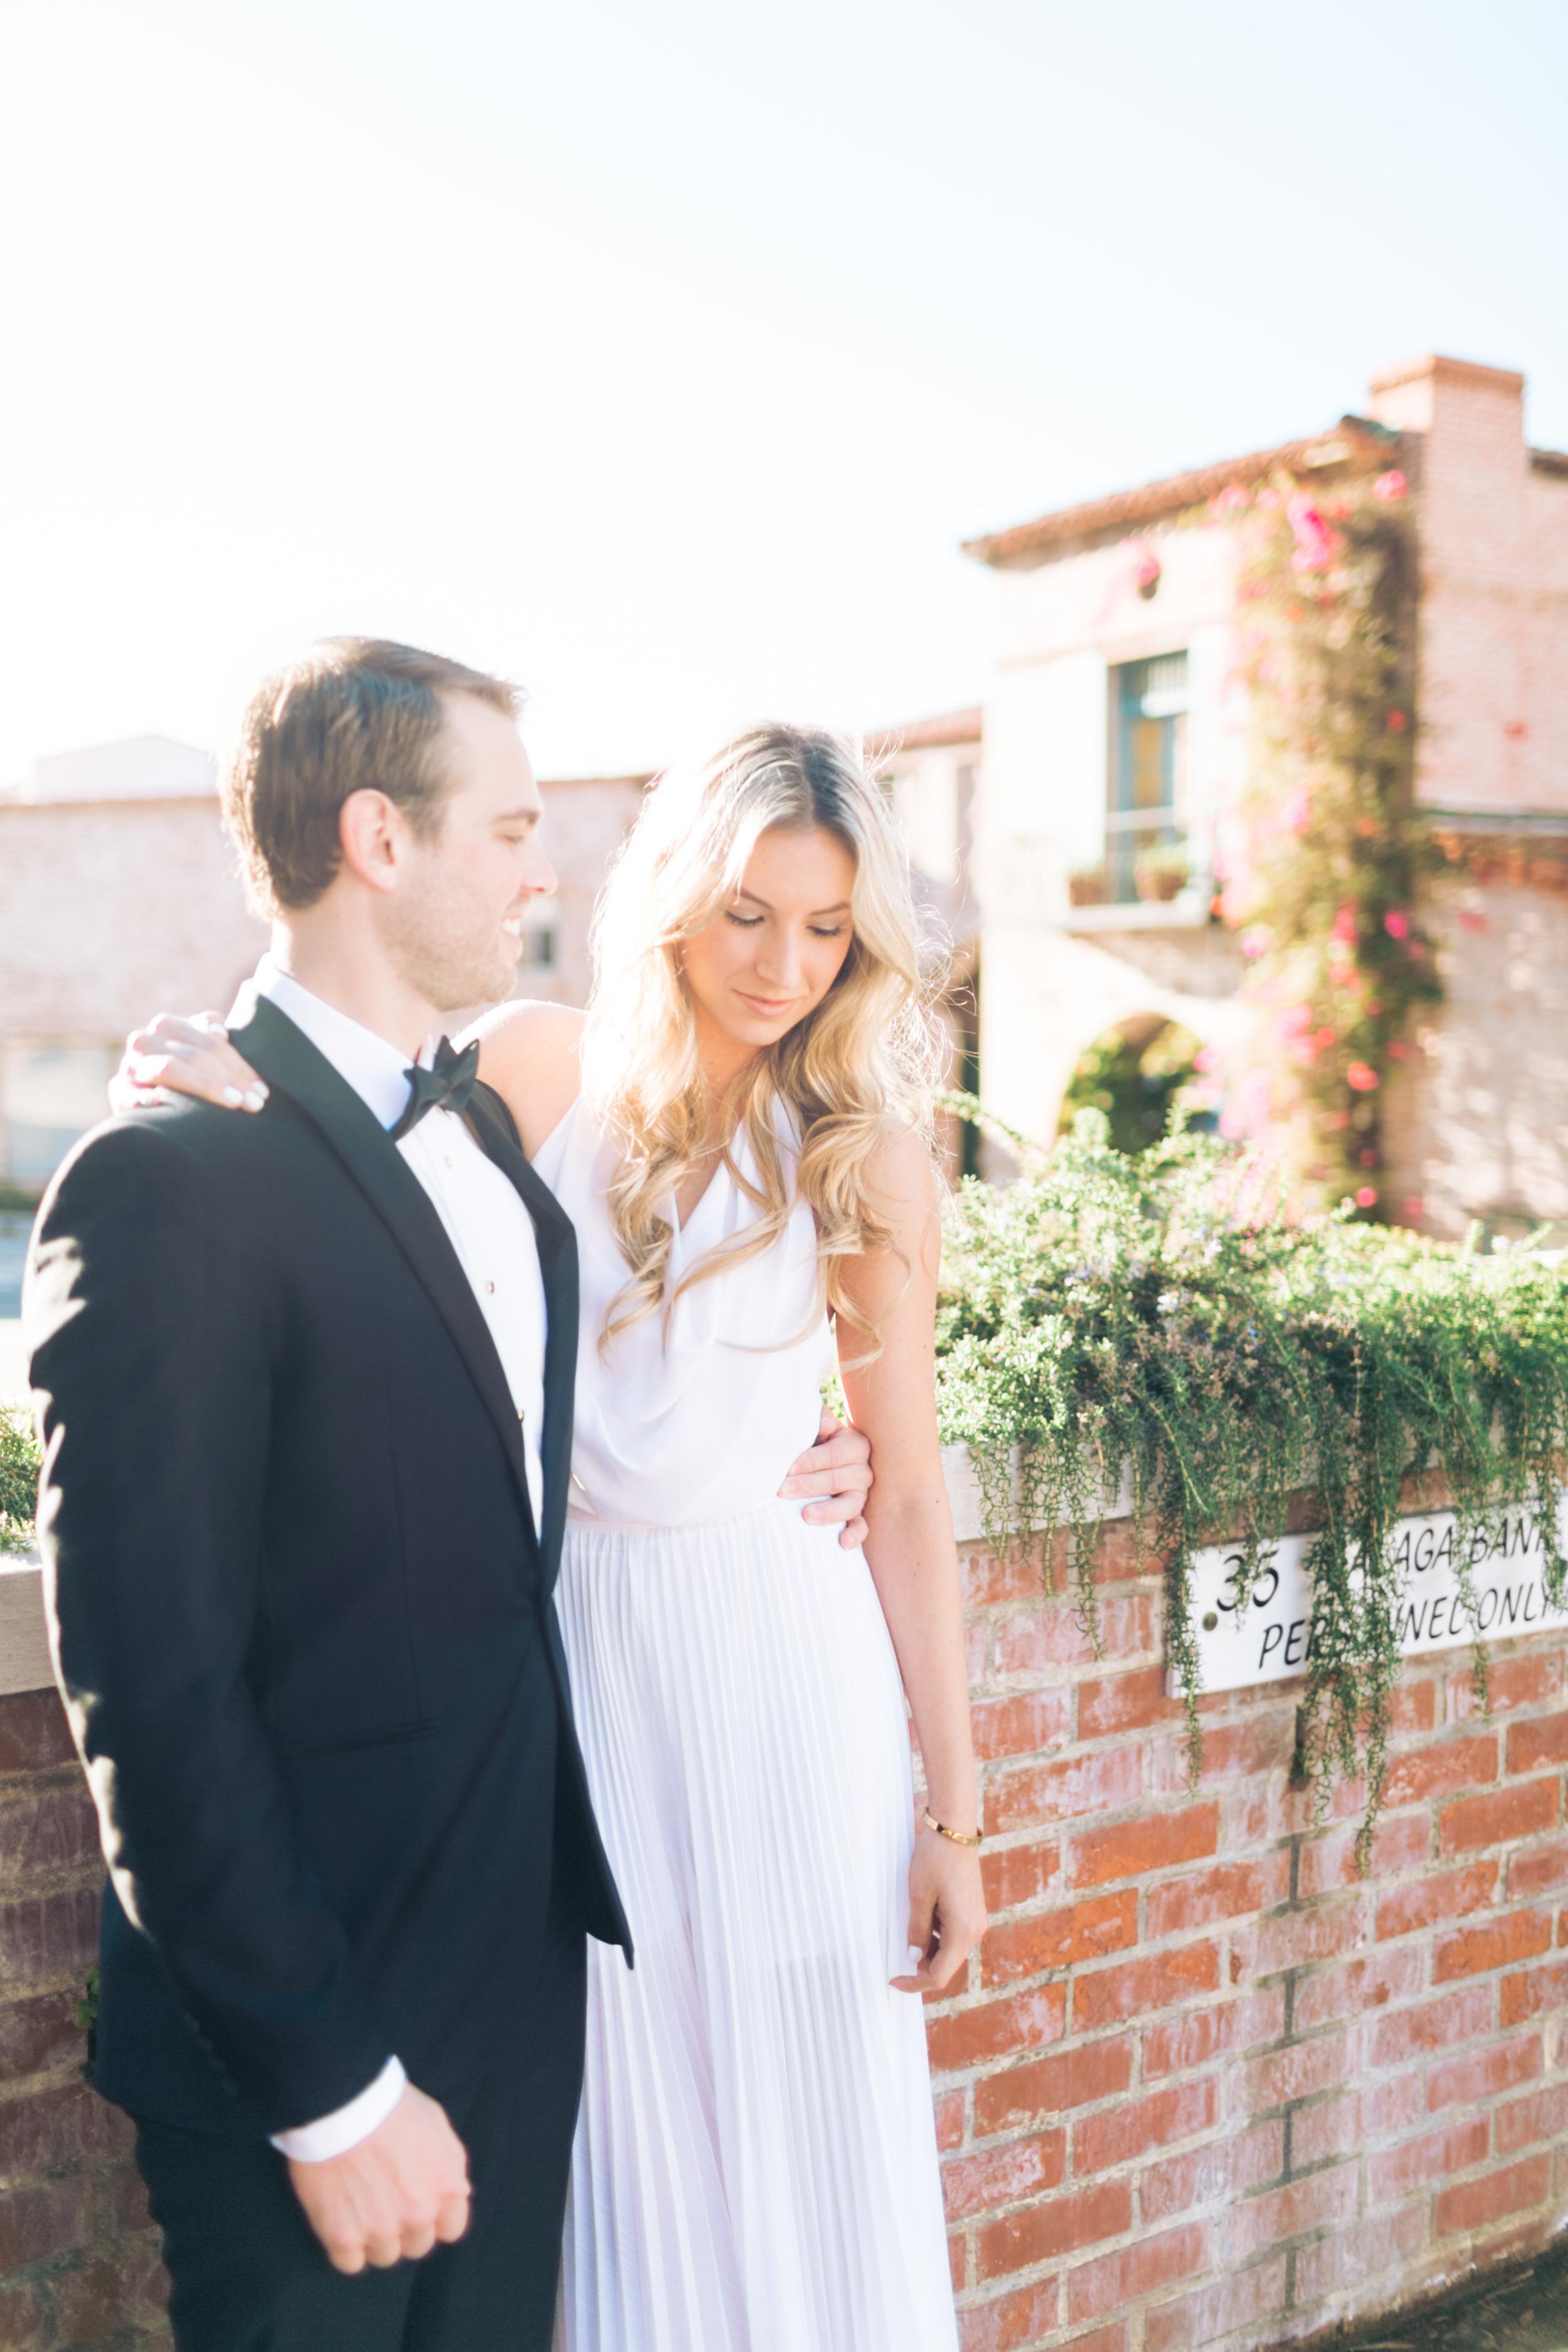 2015Natalie Schutt Photography- Palos Verdes Wedding-1.JPG